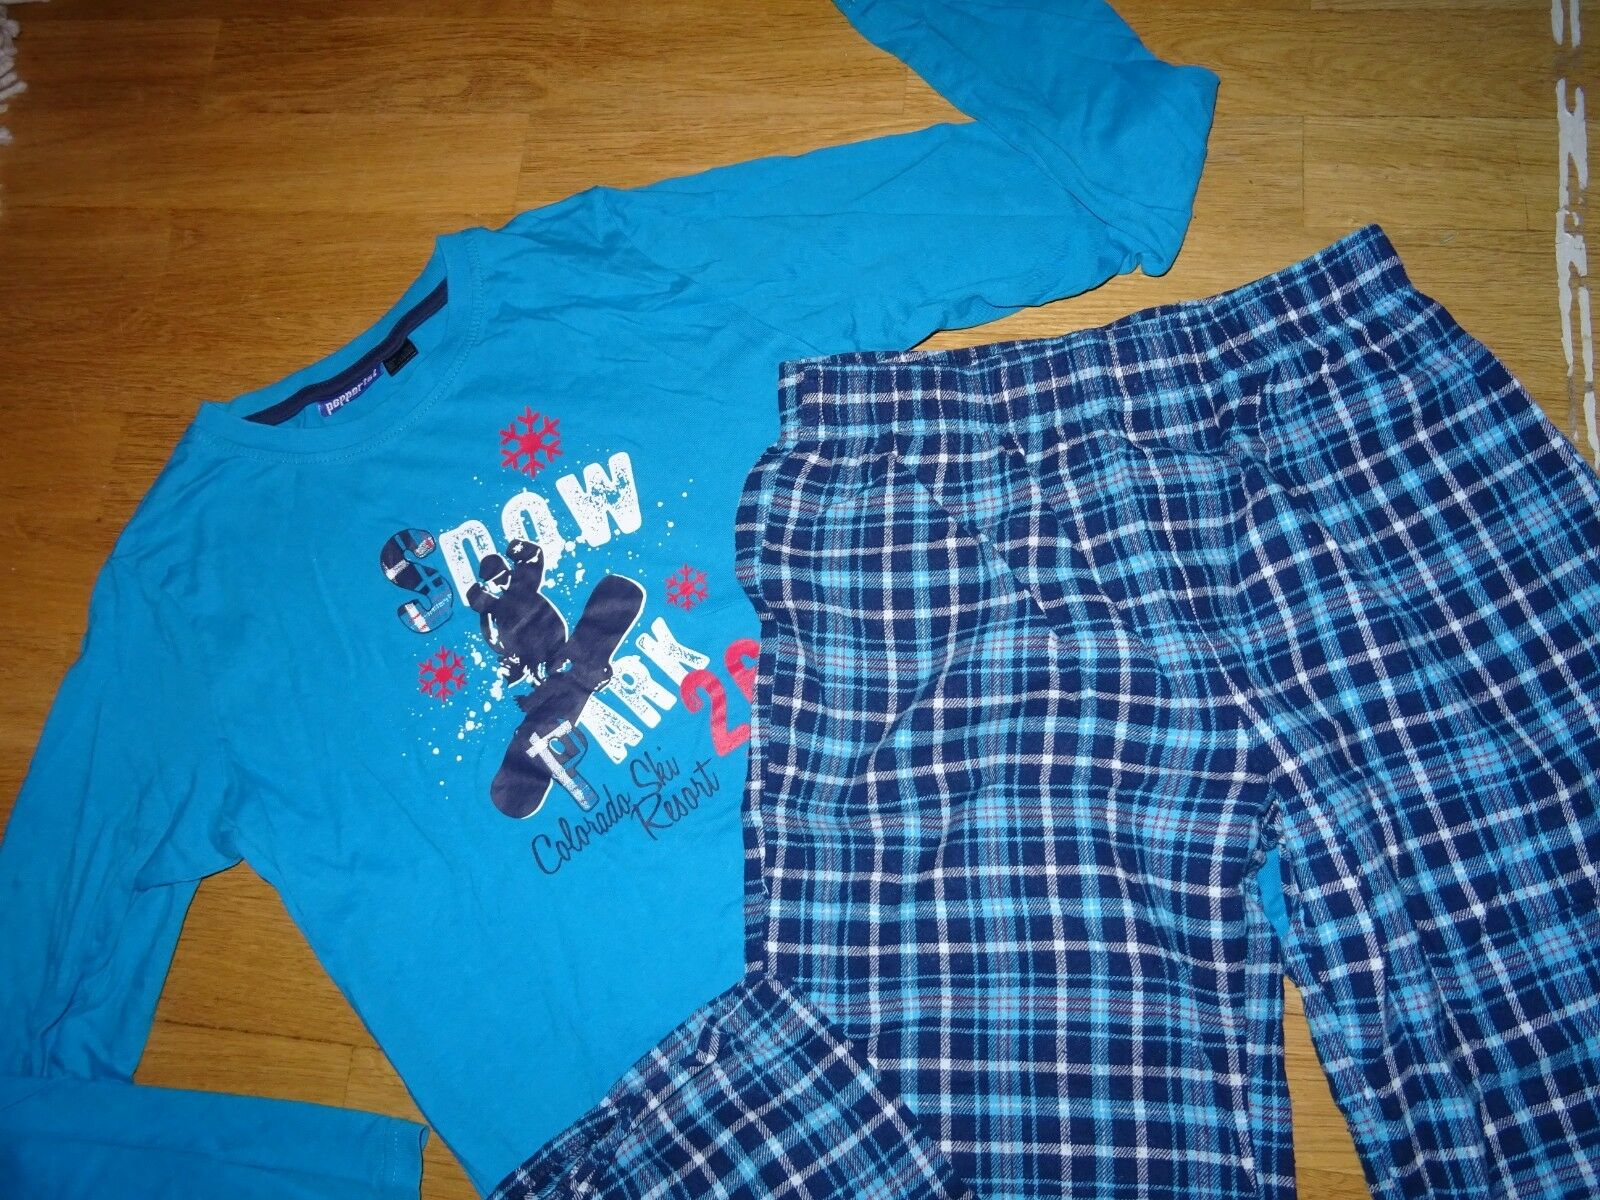 ebe22365f3 Pyjamahose Jungen 152 Test Vergleich +++ Pyjamahose Jungen 152 ...